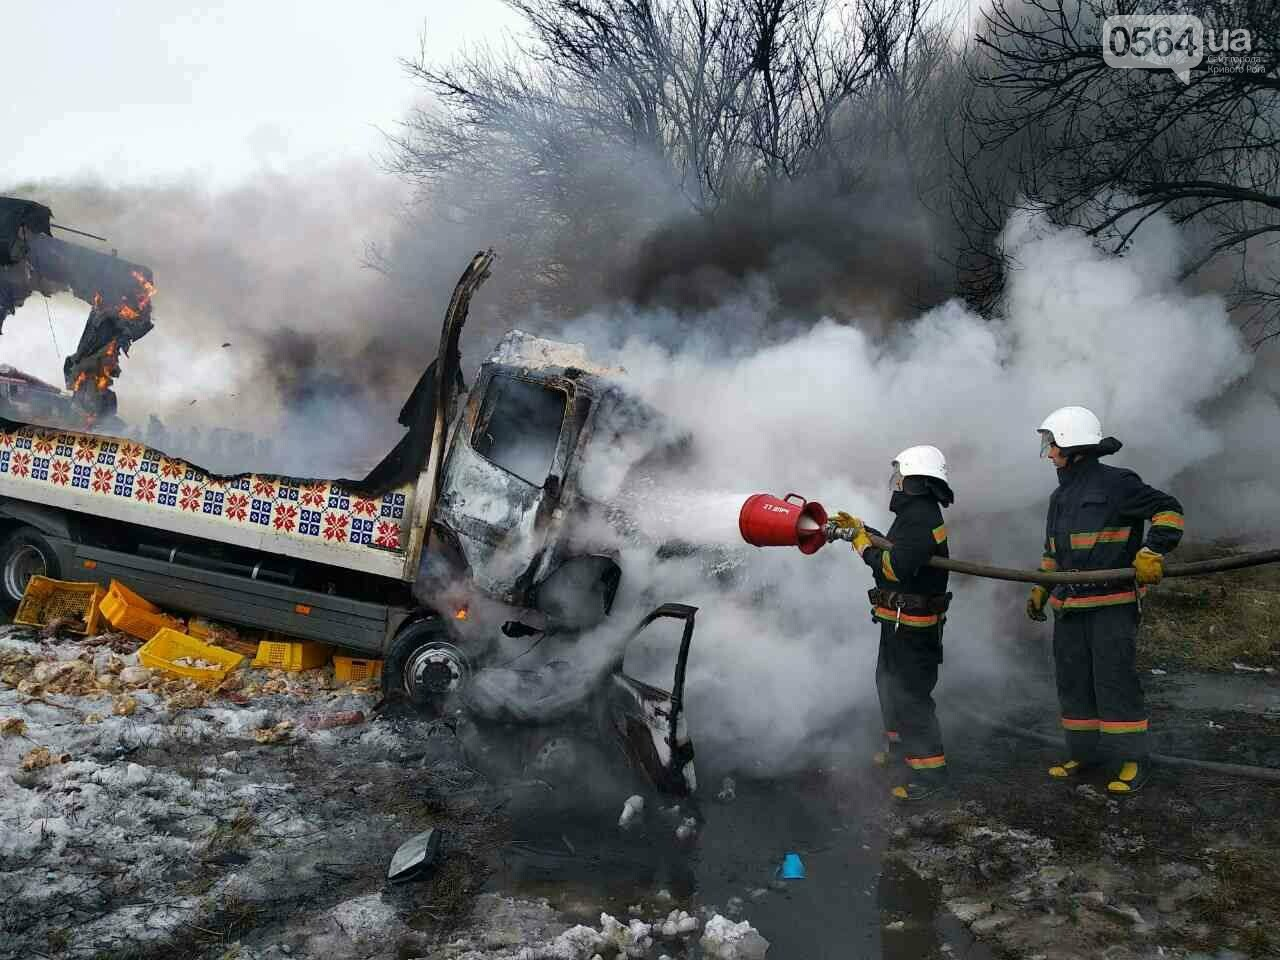 На Днепропетровщине грузовик столкнулся с легковушкой. 3 человека погибли (ФОТО), фото-2